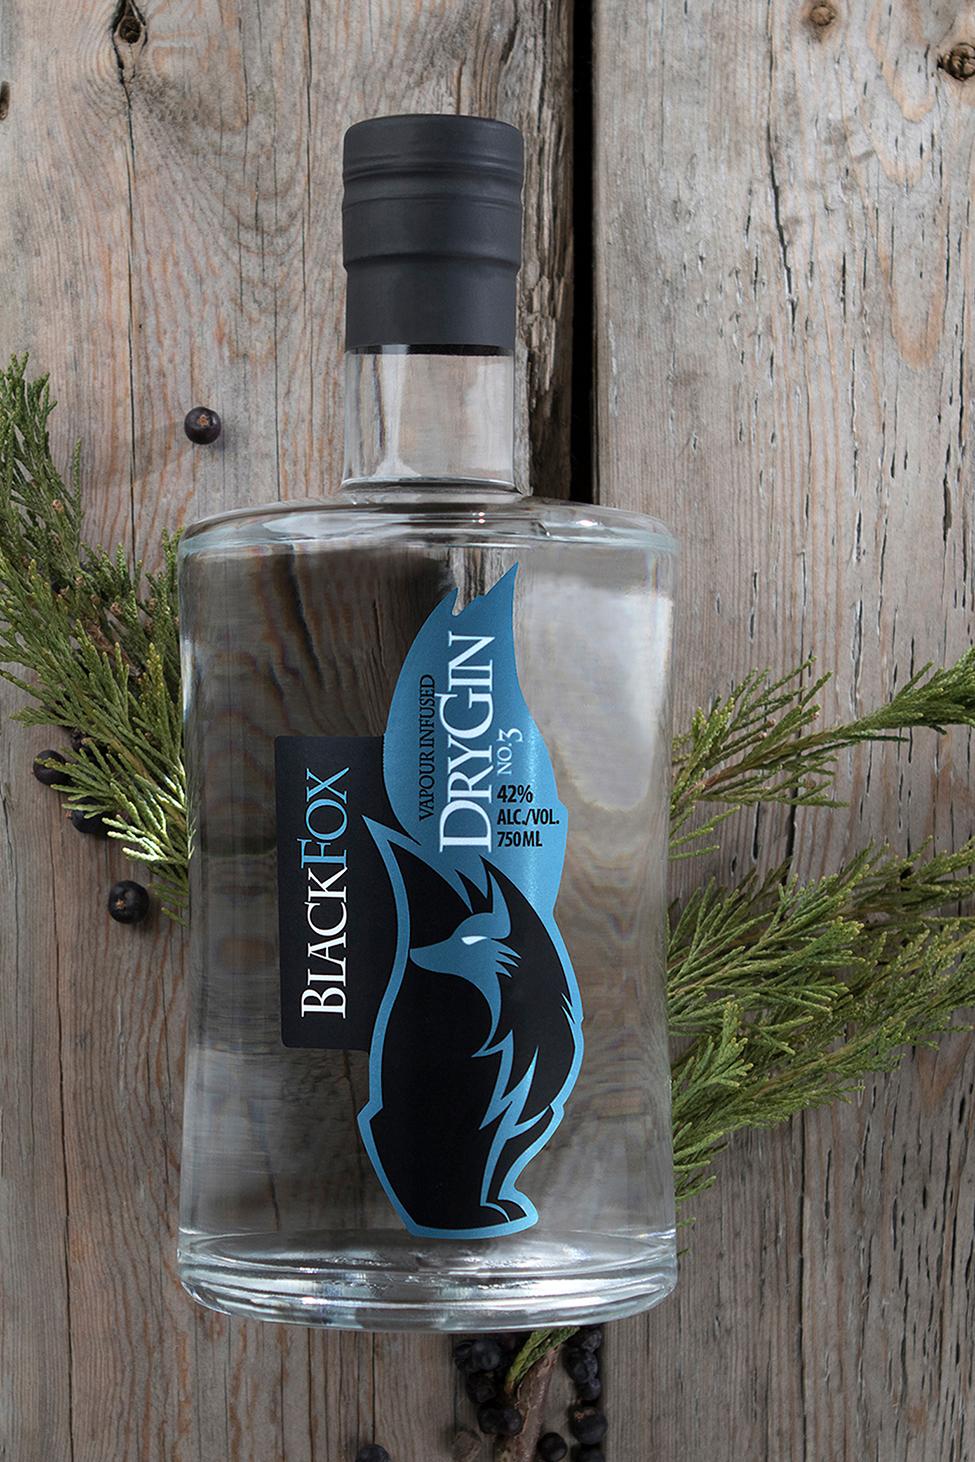 Black Fox Gin - Handcrafted Single Batch